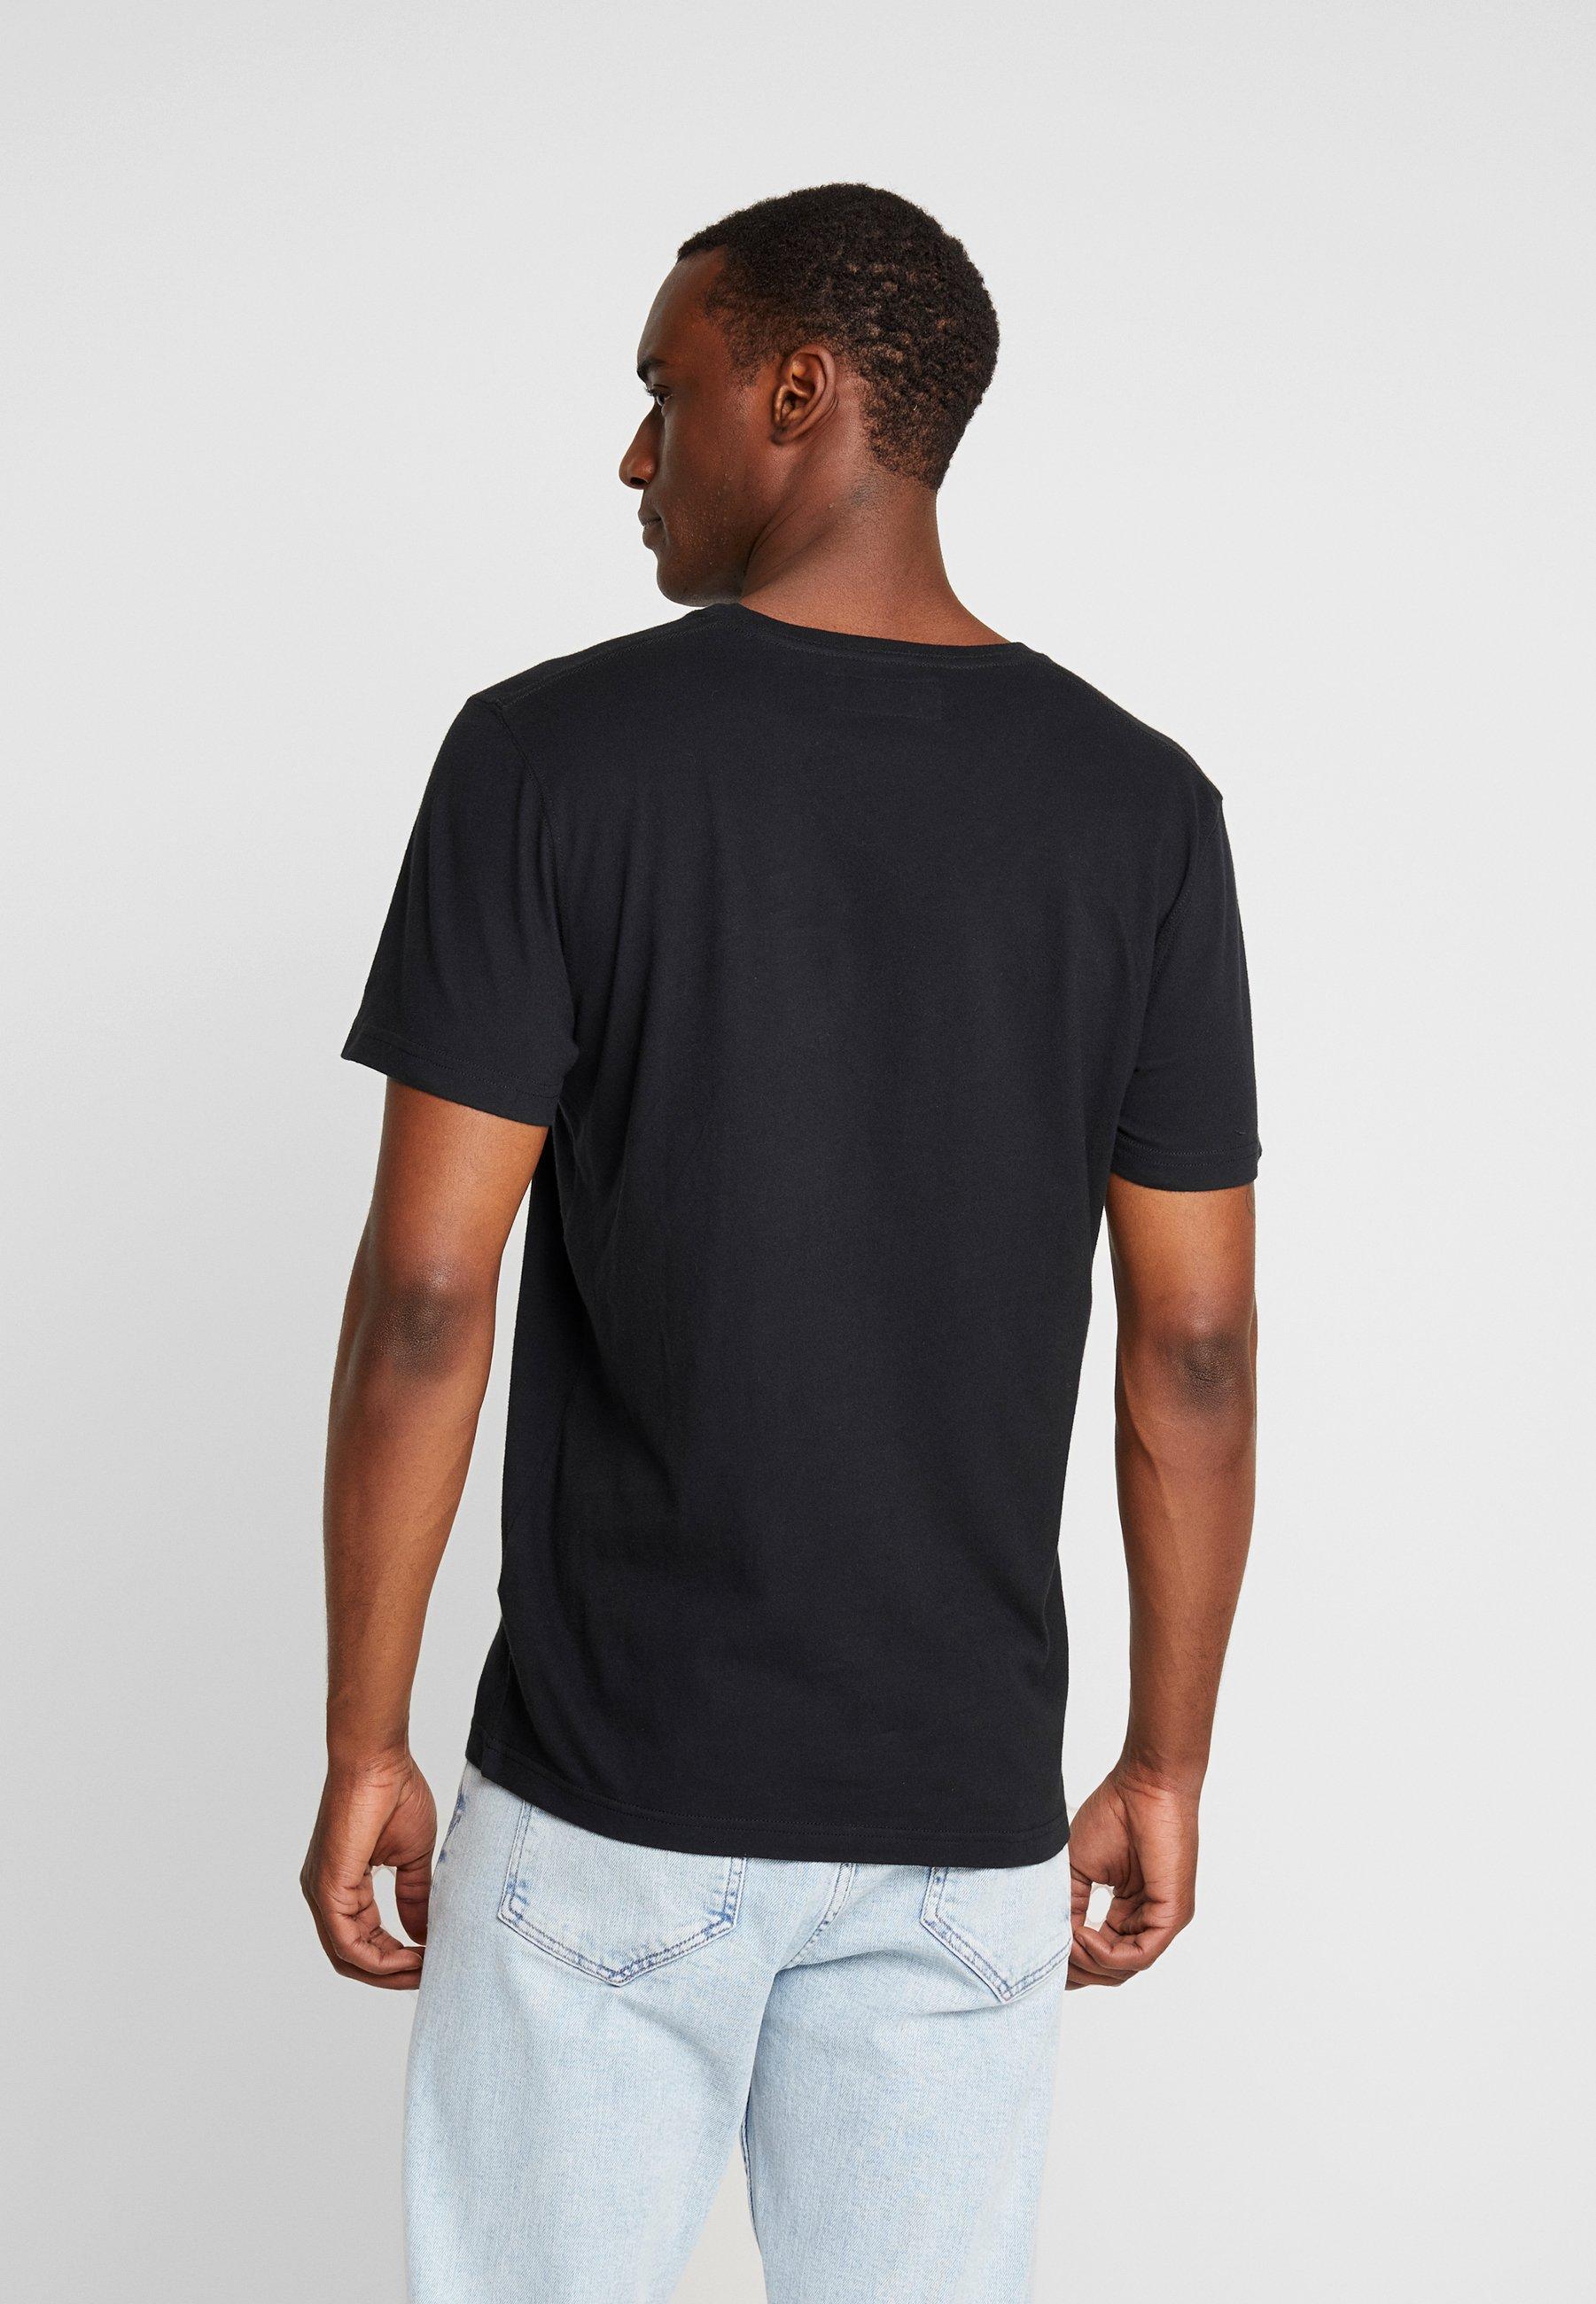 Icon NeutralT Black Fitch Vee Basique Abercrombieamp; shirt vm7yfIb6gY